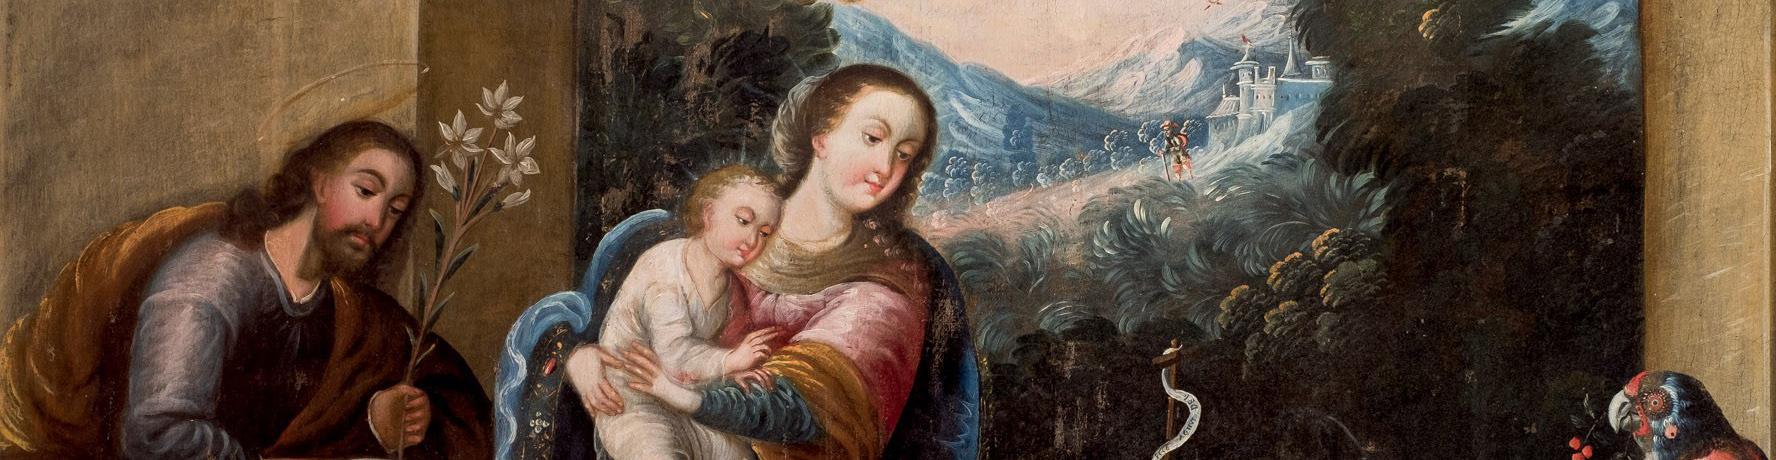 Taller de Diego Quipe Tito. Sagrada Familia con san Juanito, detalle